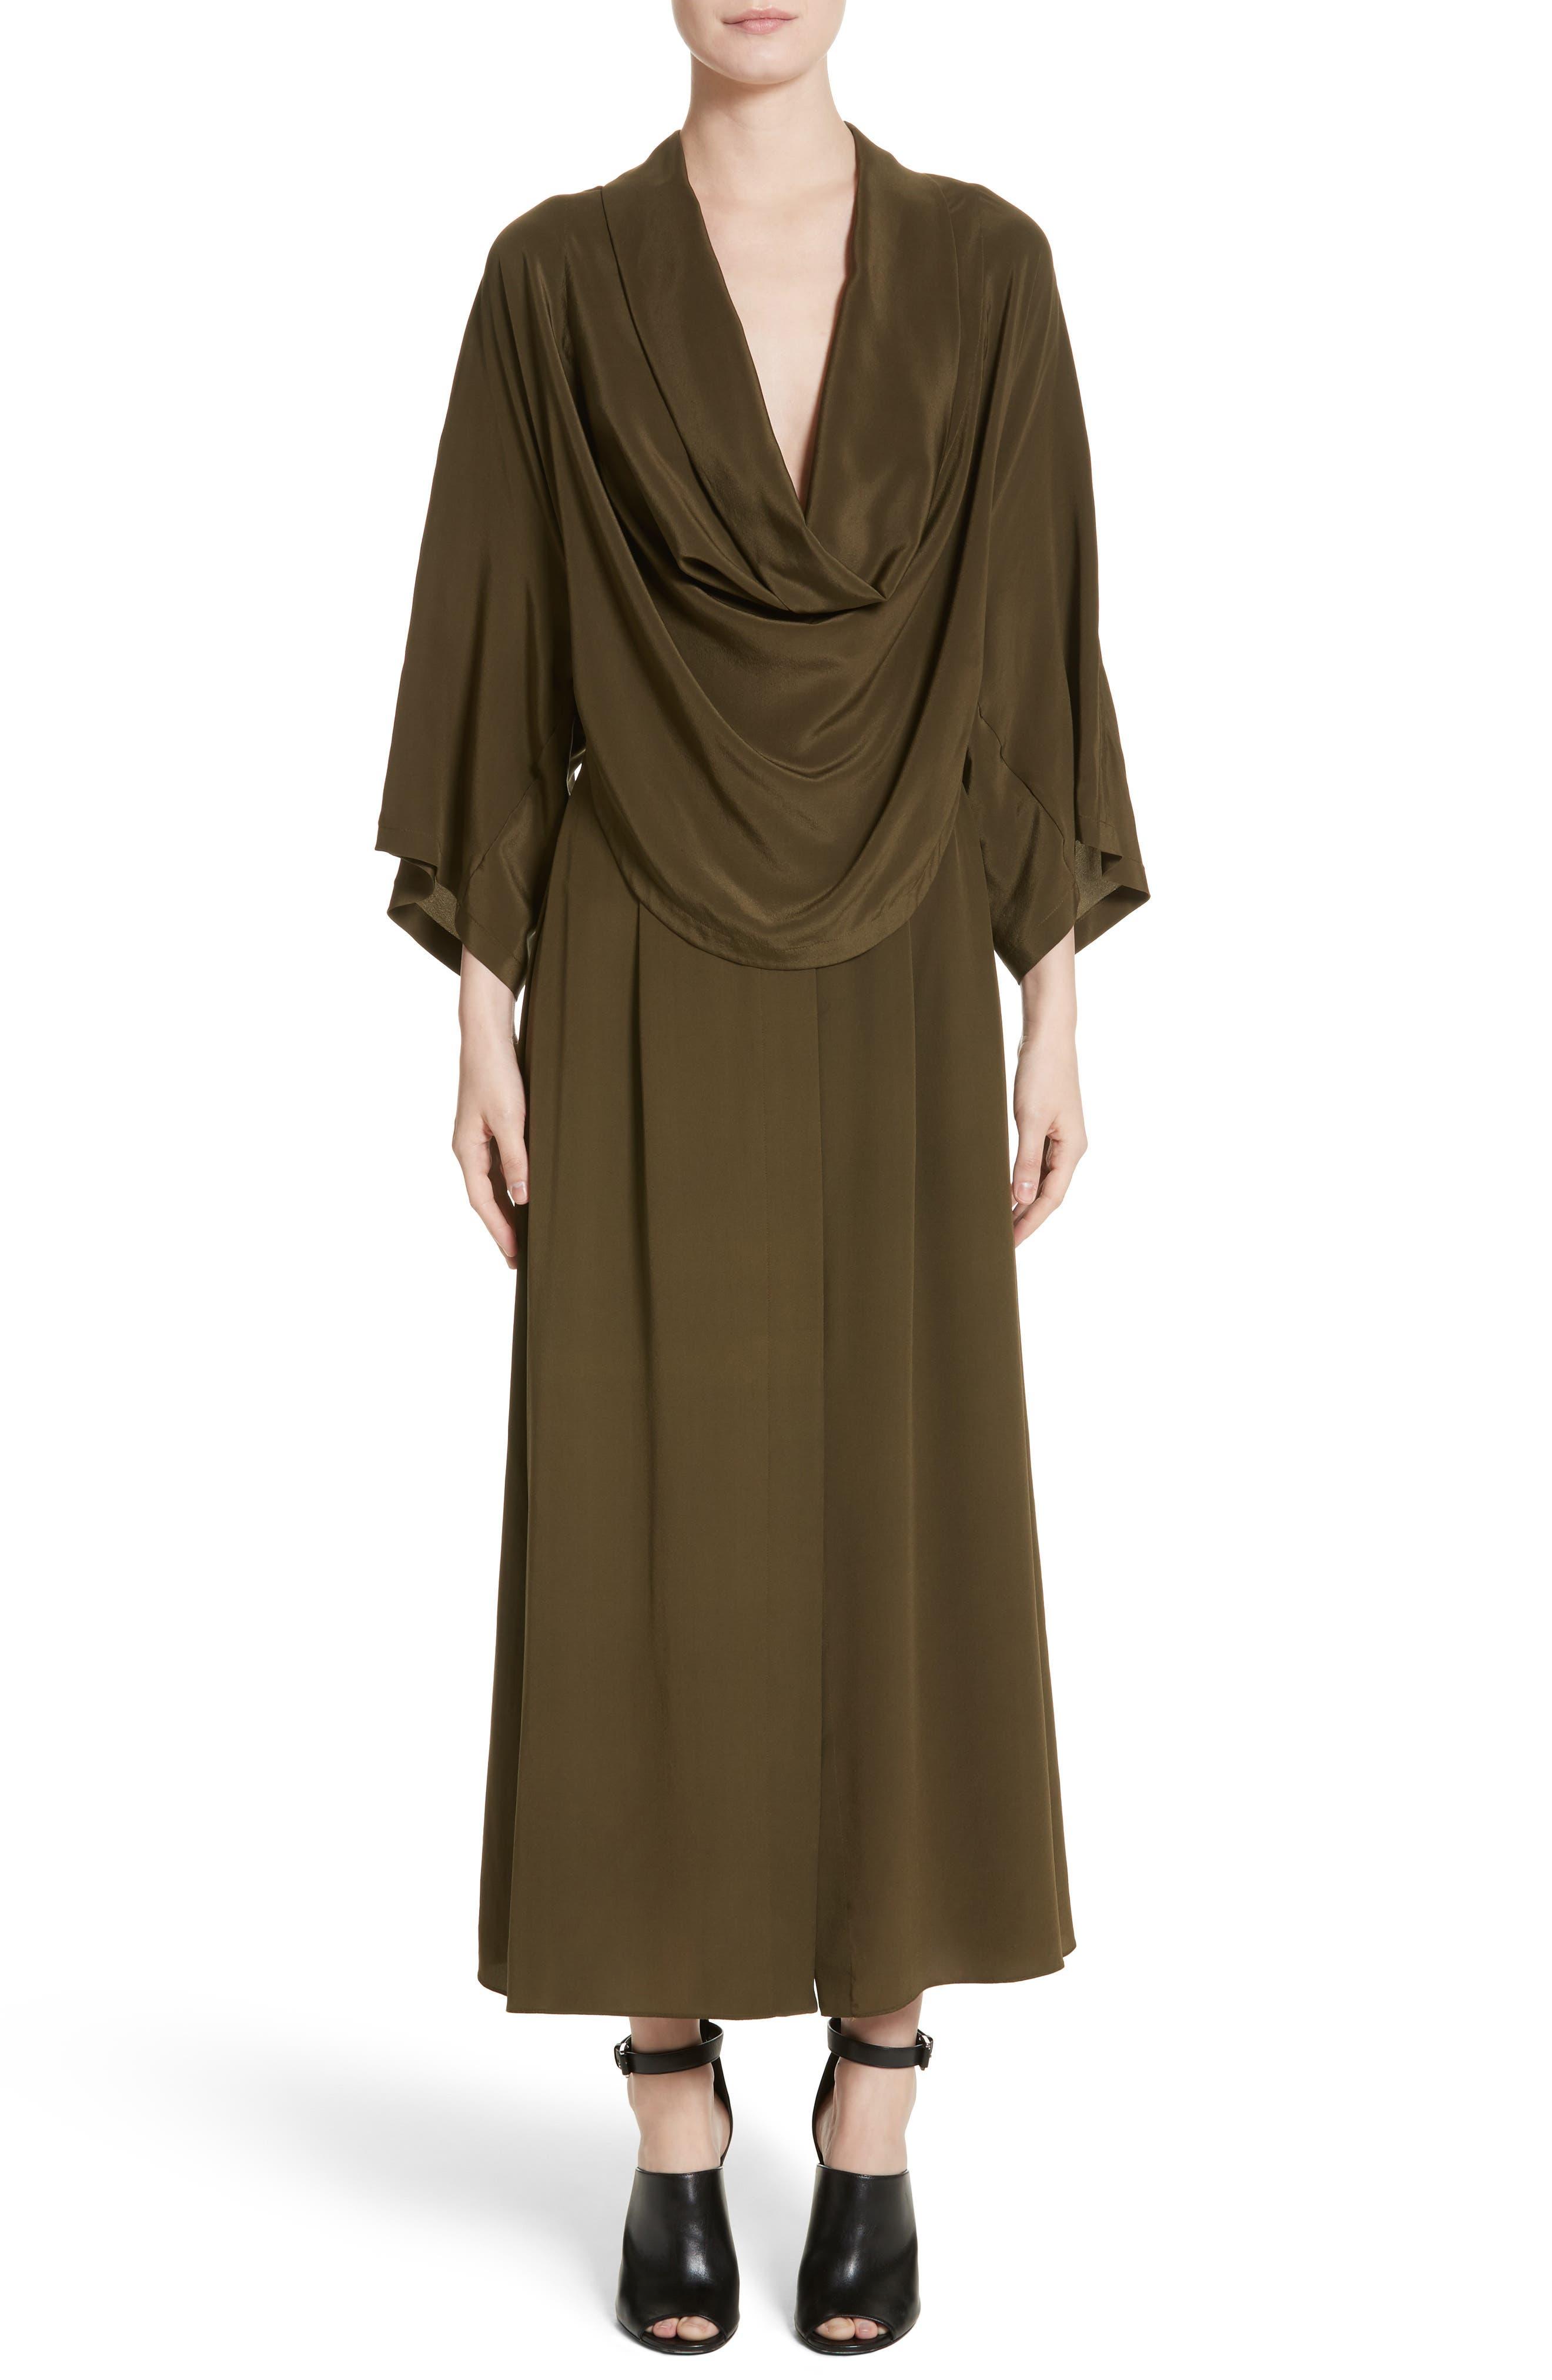 Alternate Image 1 Selected - Michael Kors Silk Crêpe de Chine Cowl Neck Shirtdress